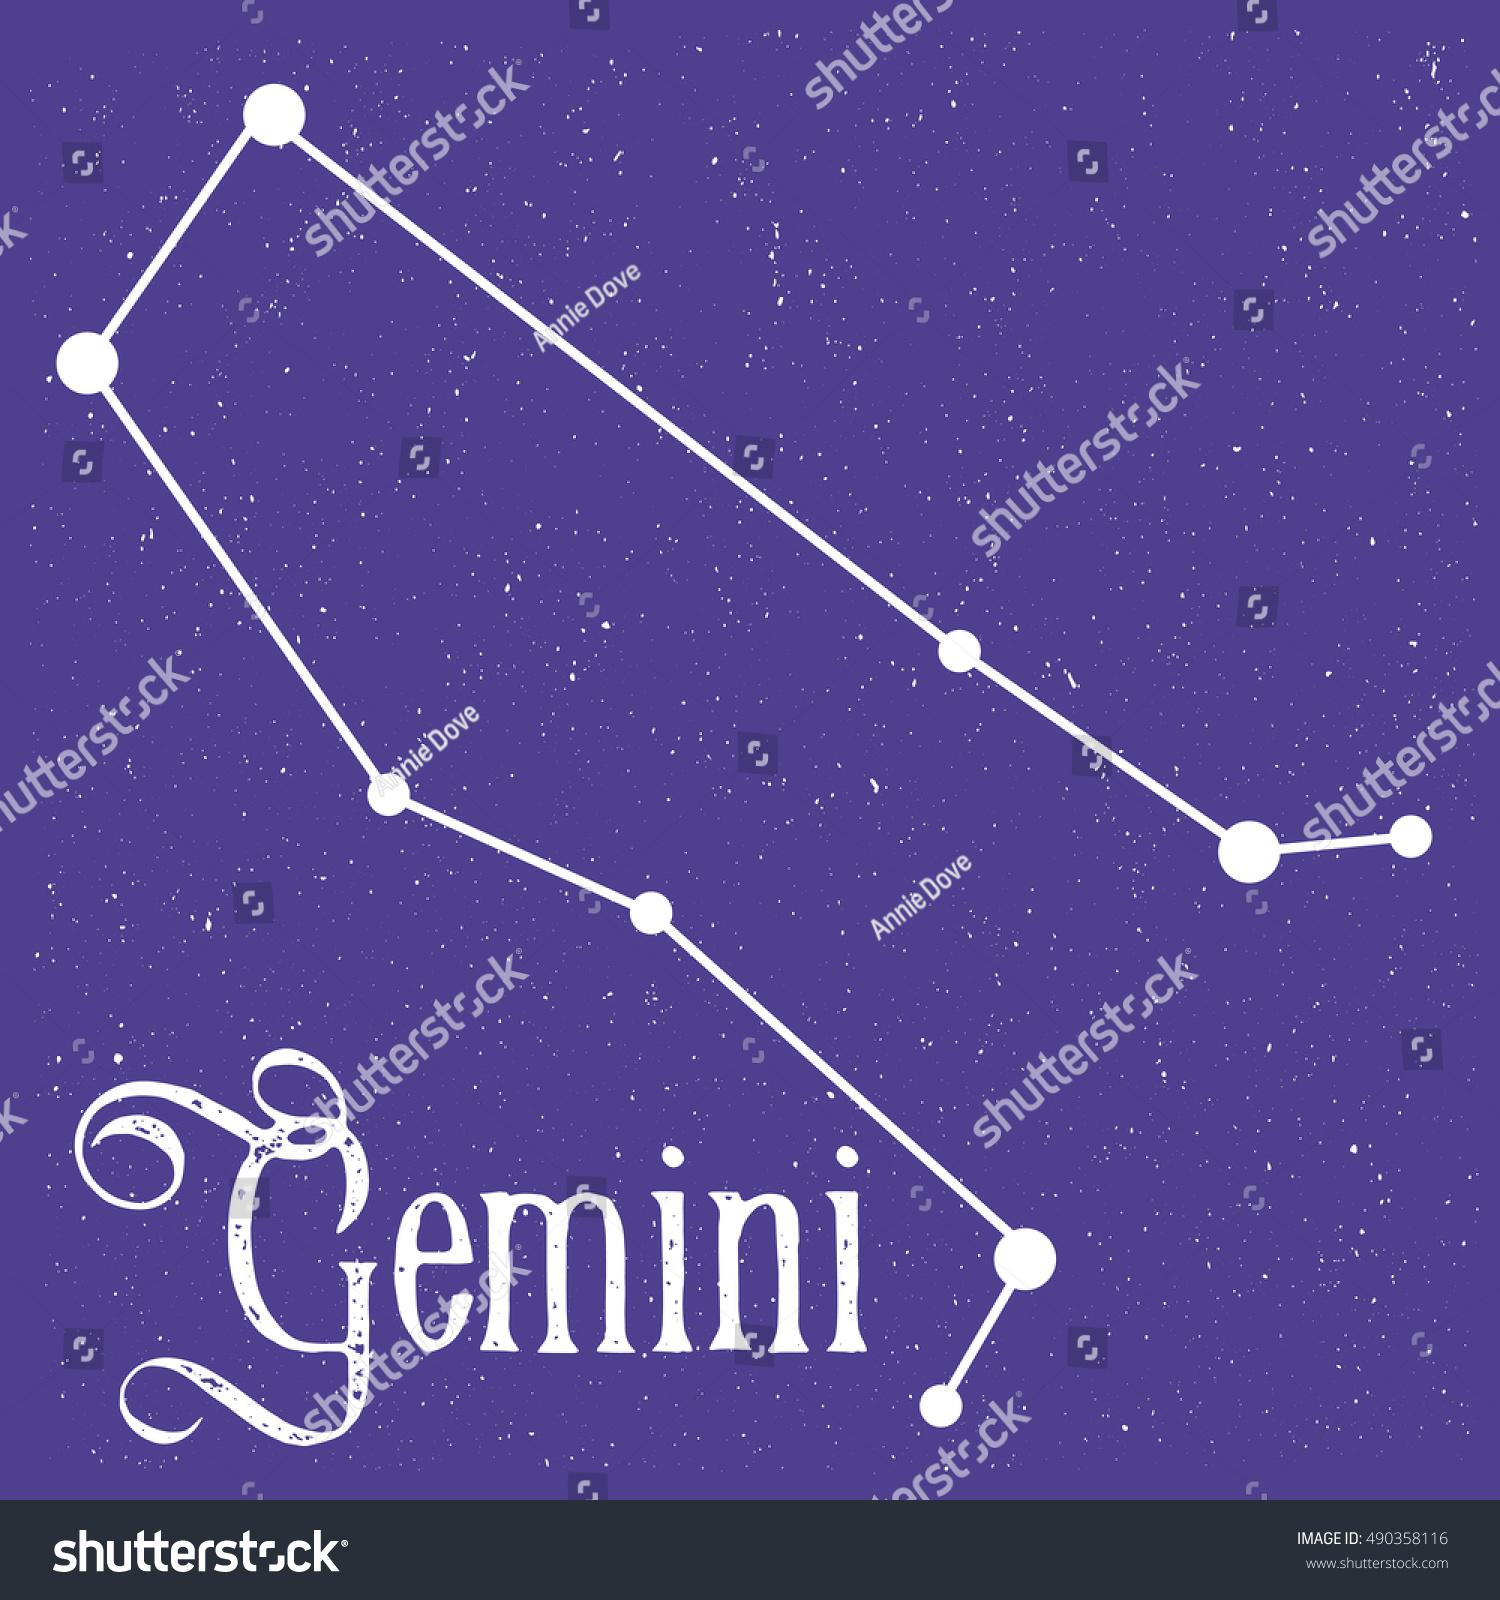 Vector linear illustration zodiac sign gemini stock vector vector linear illustration of the zodiac sign gemini with text gemini and symbol from stars at buycottarizona